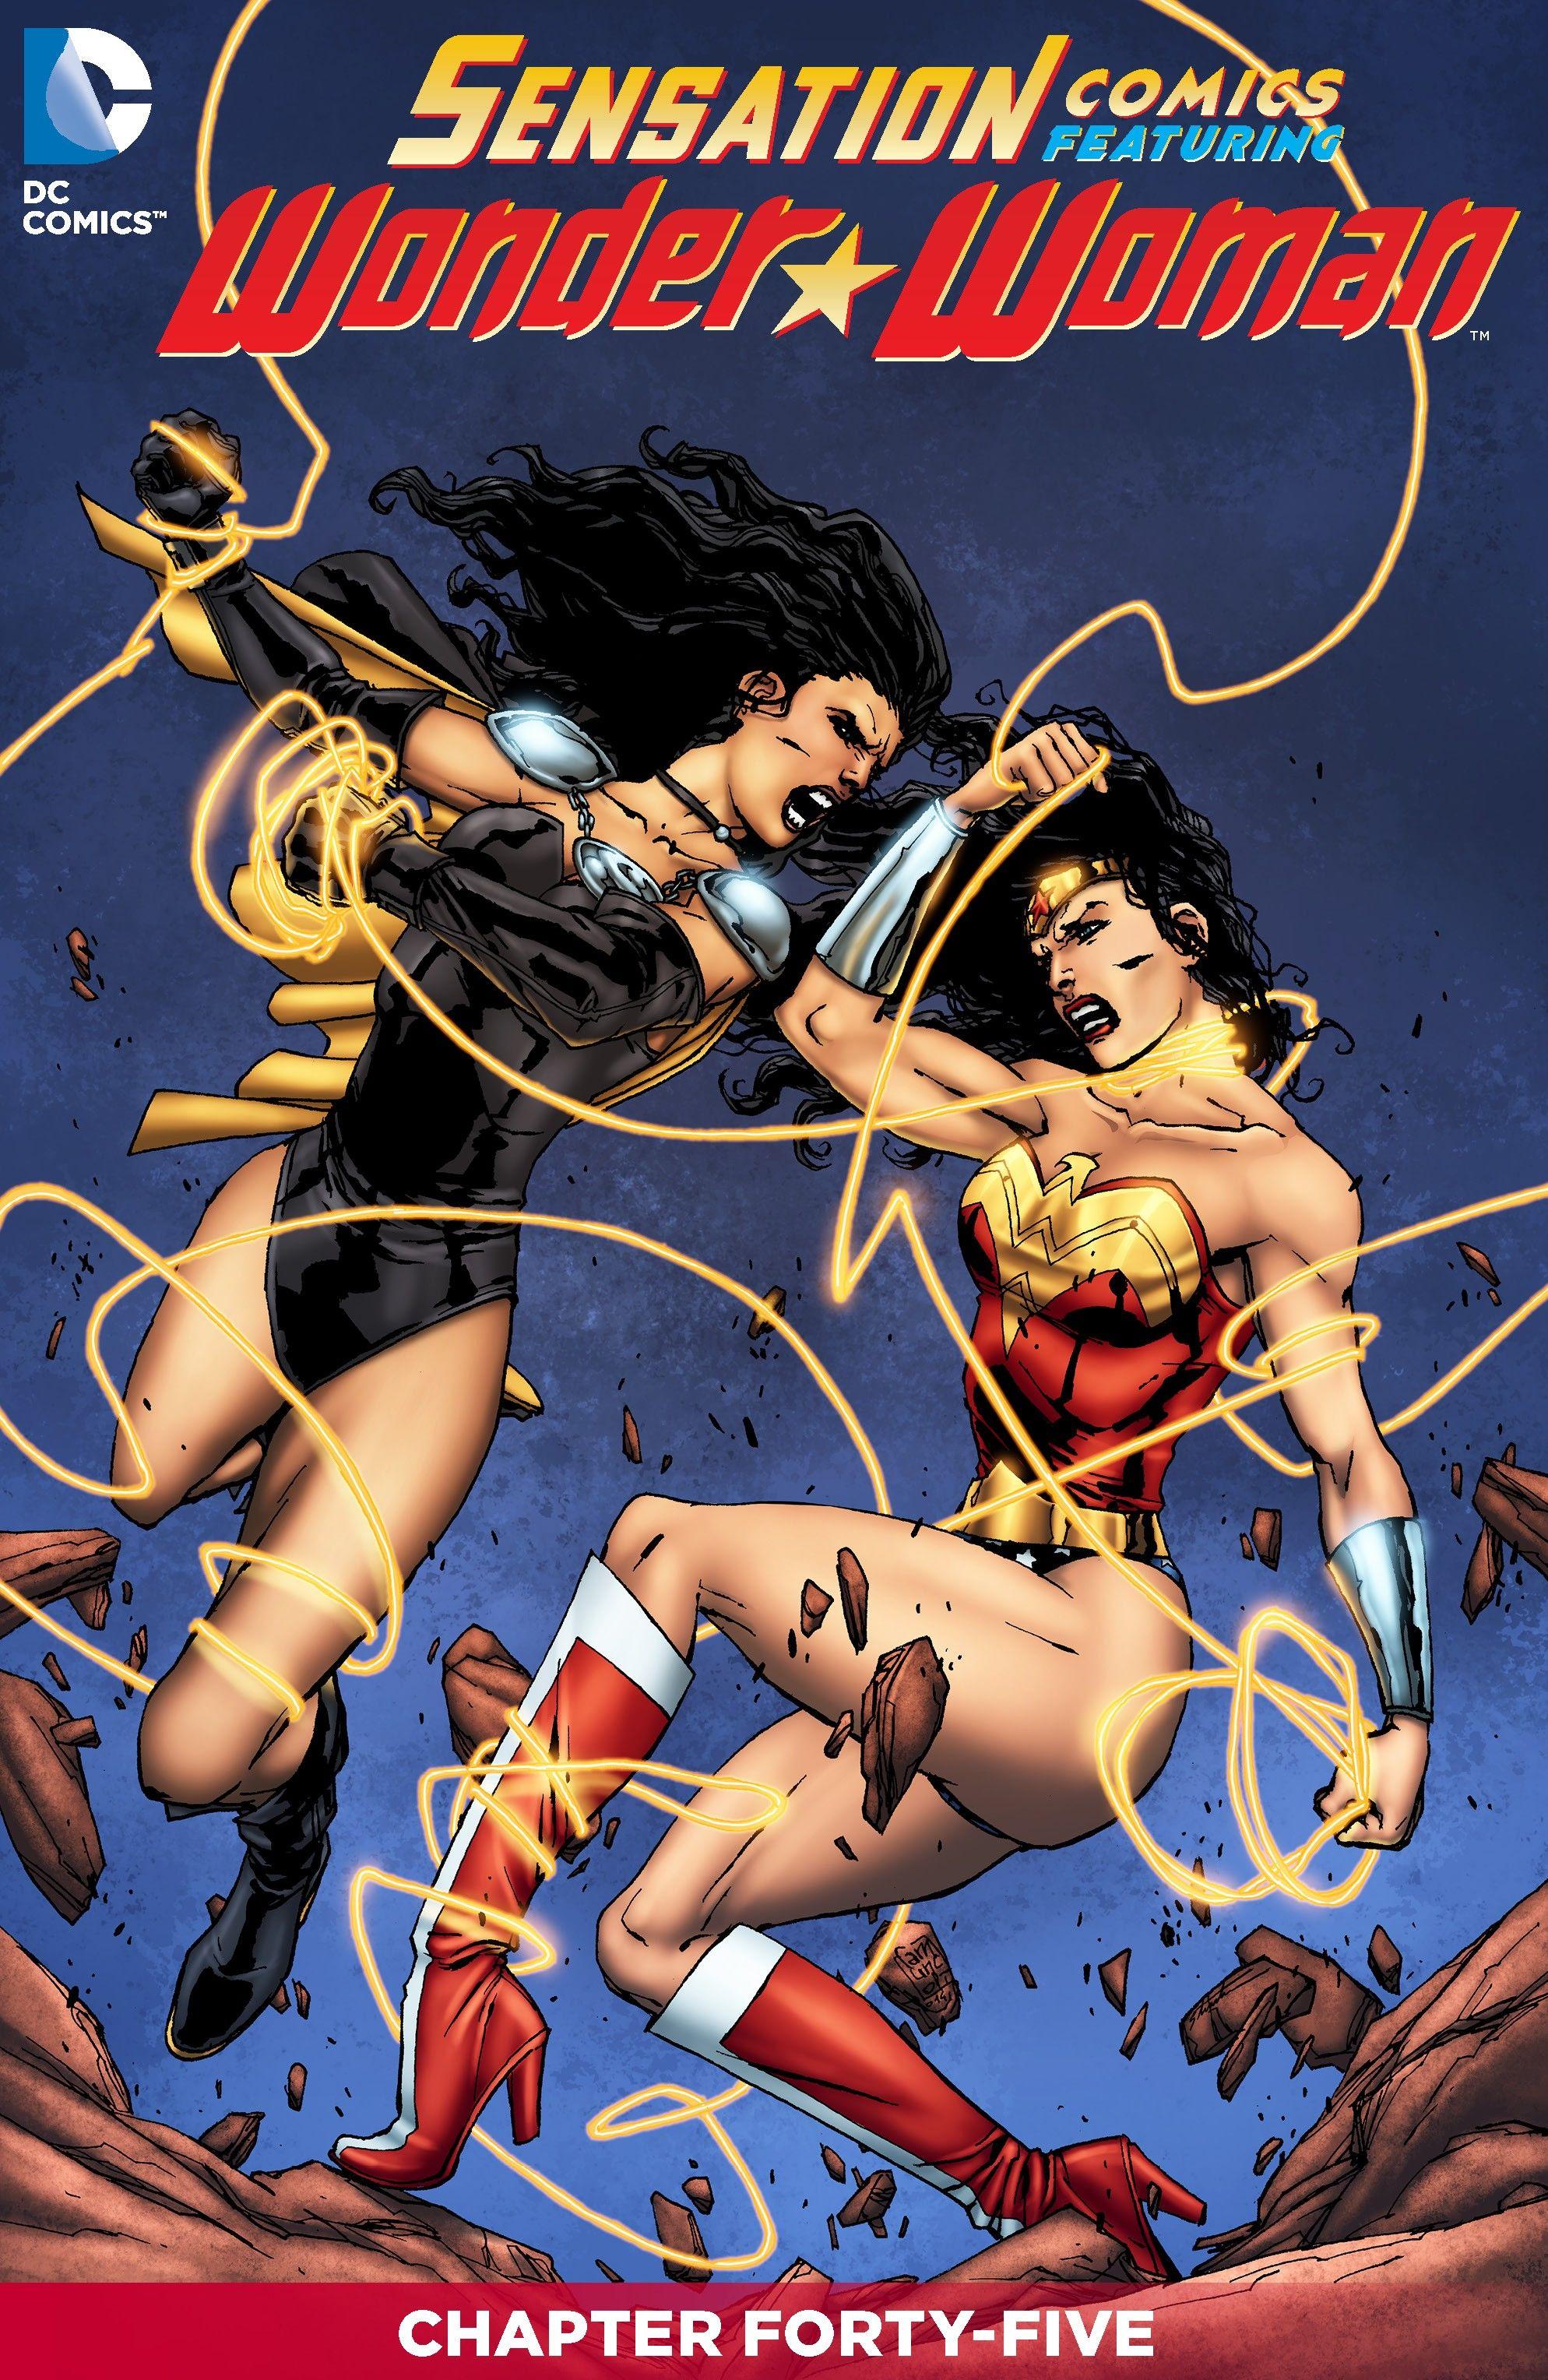 Read online Sensation Comics Featuring Wonder Woman comic -  Issue #45 - 2